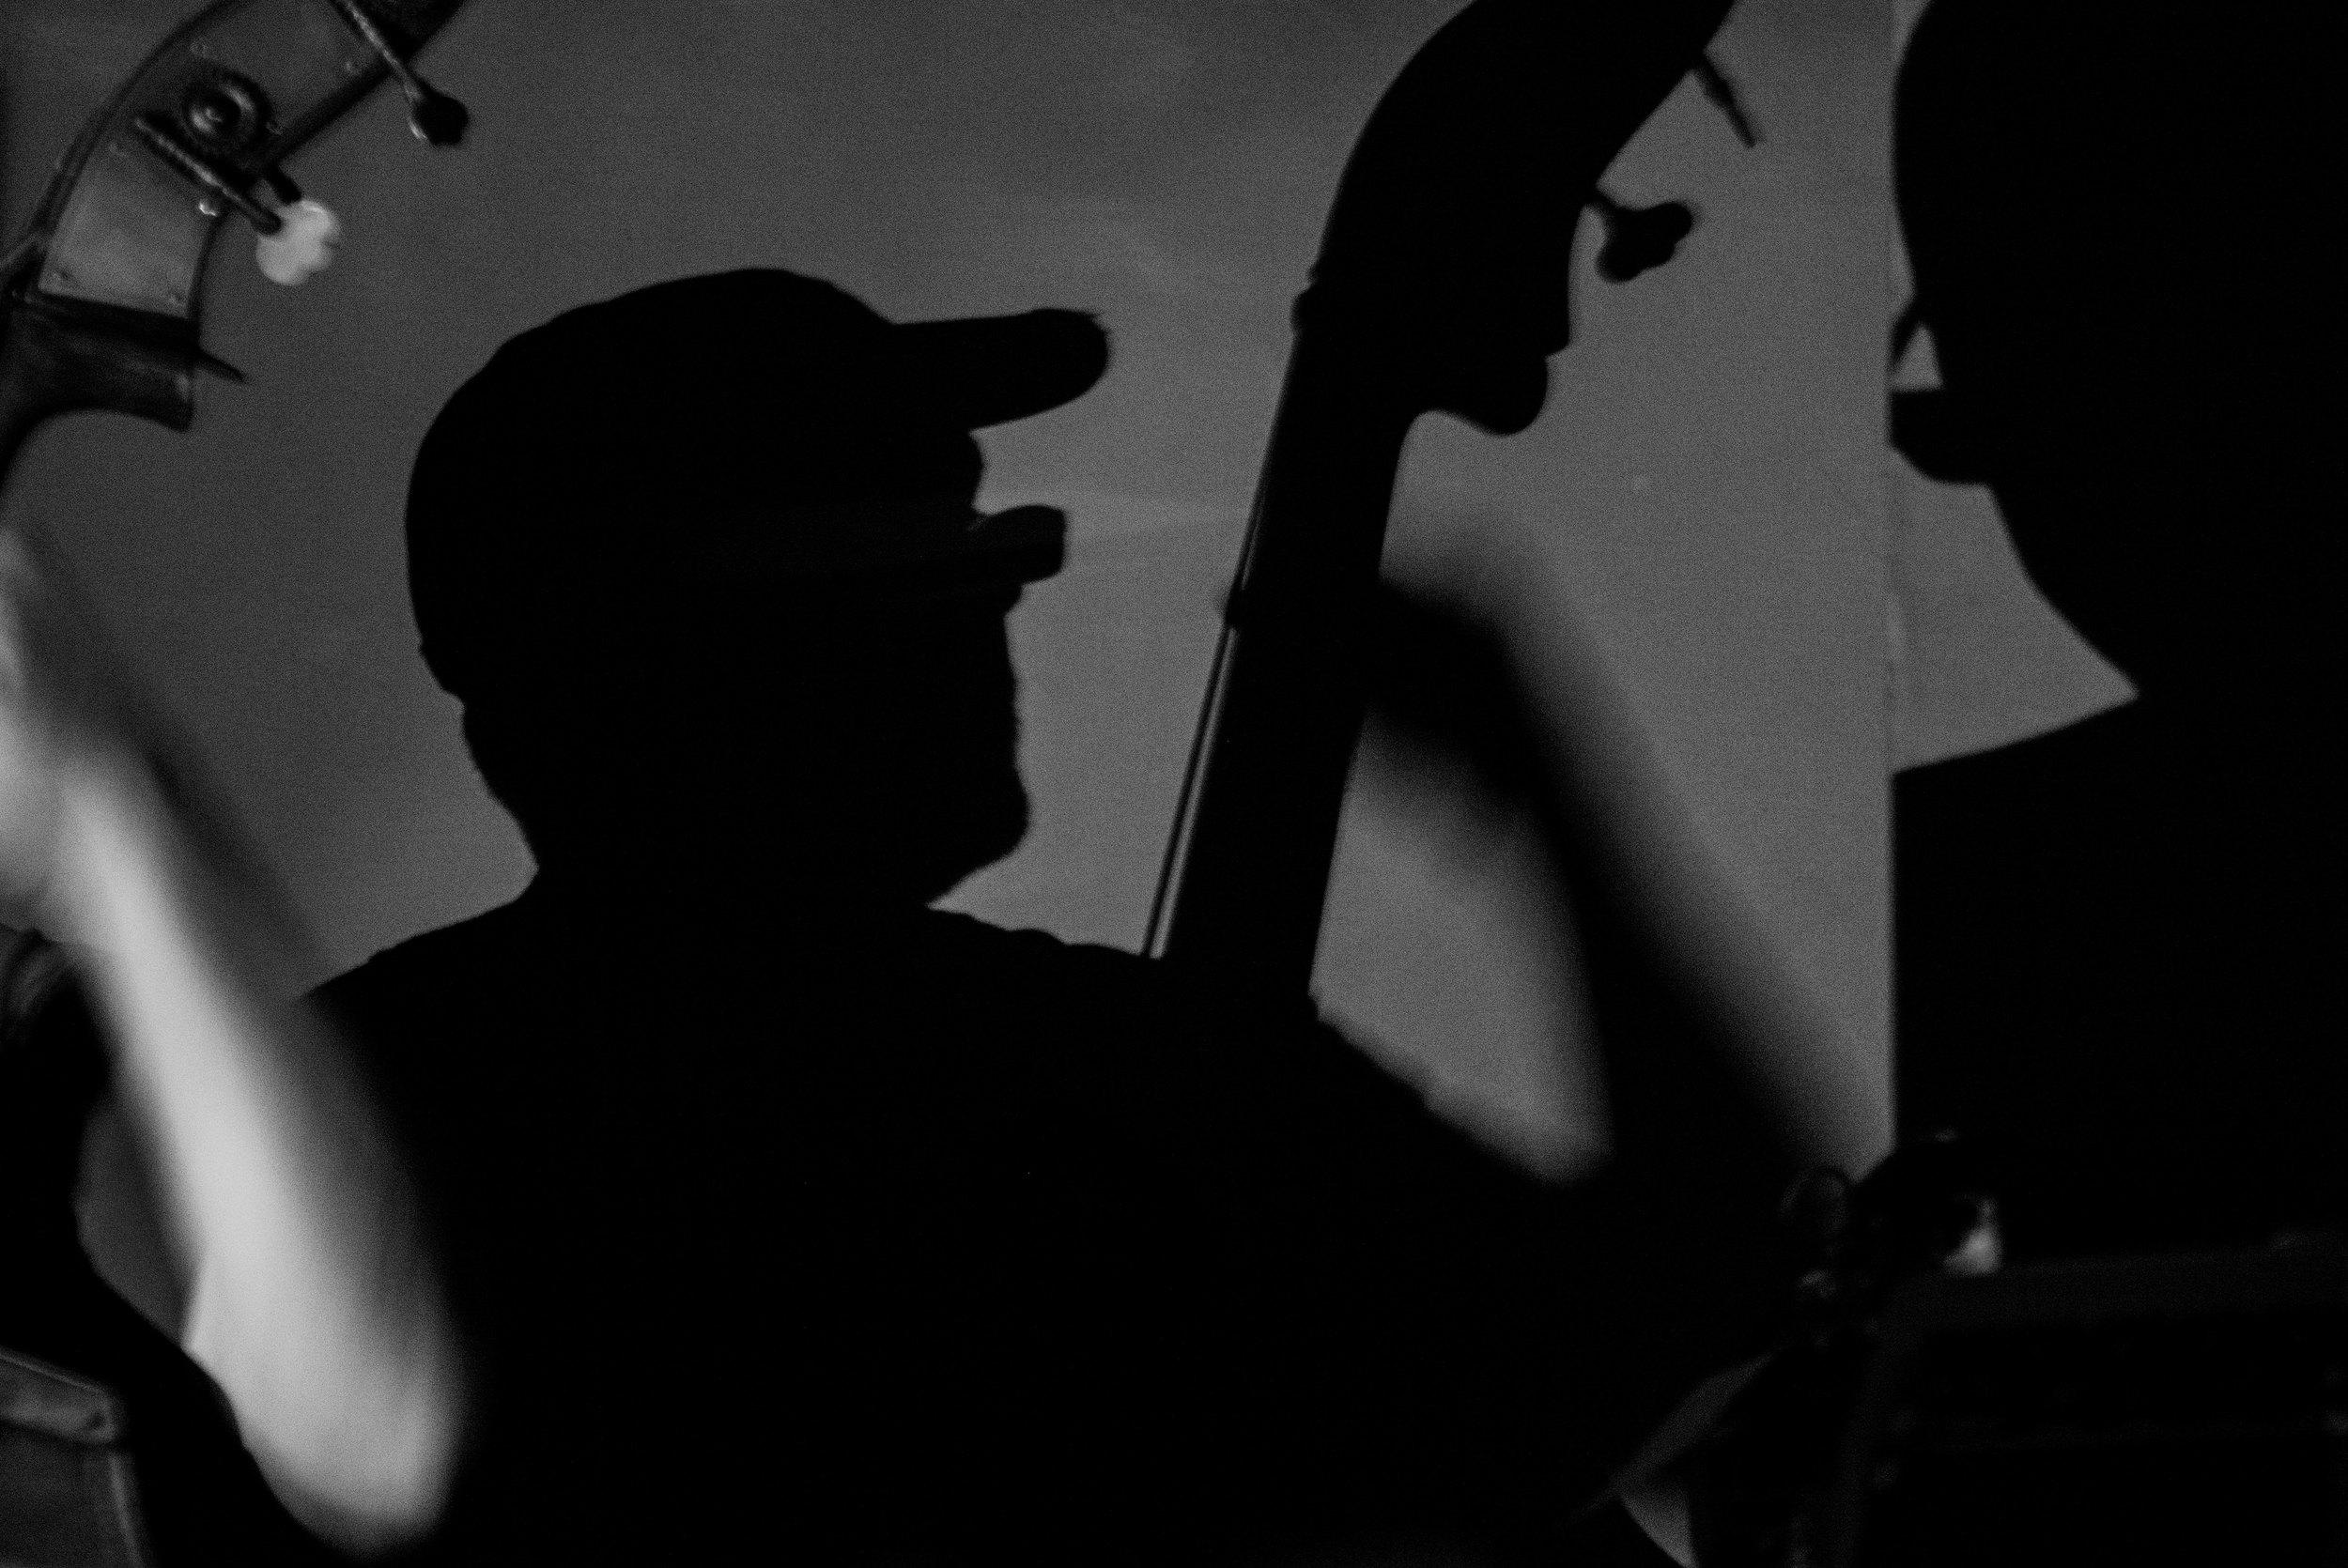 Shadows and Bass